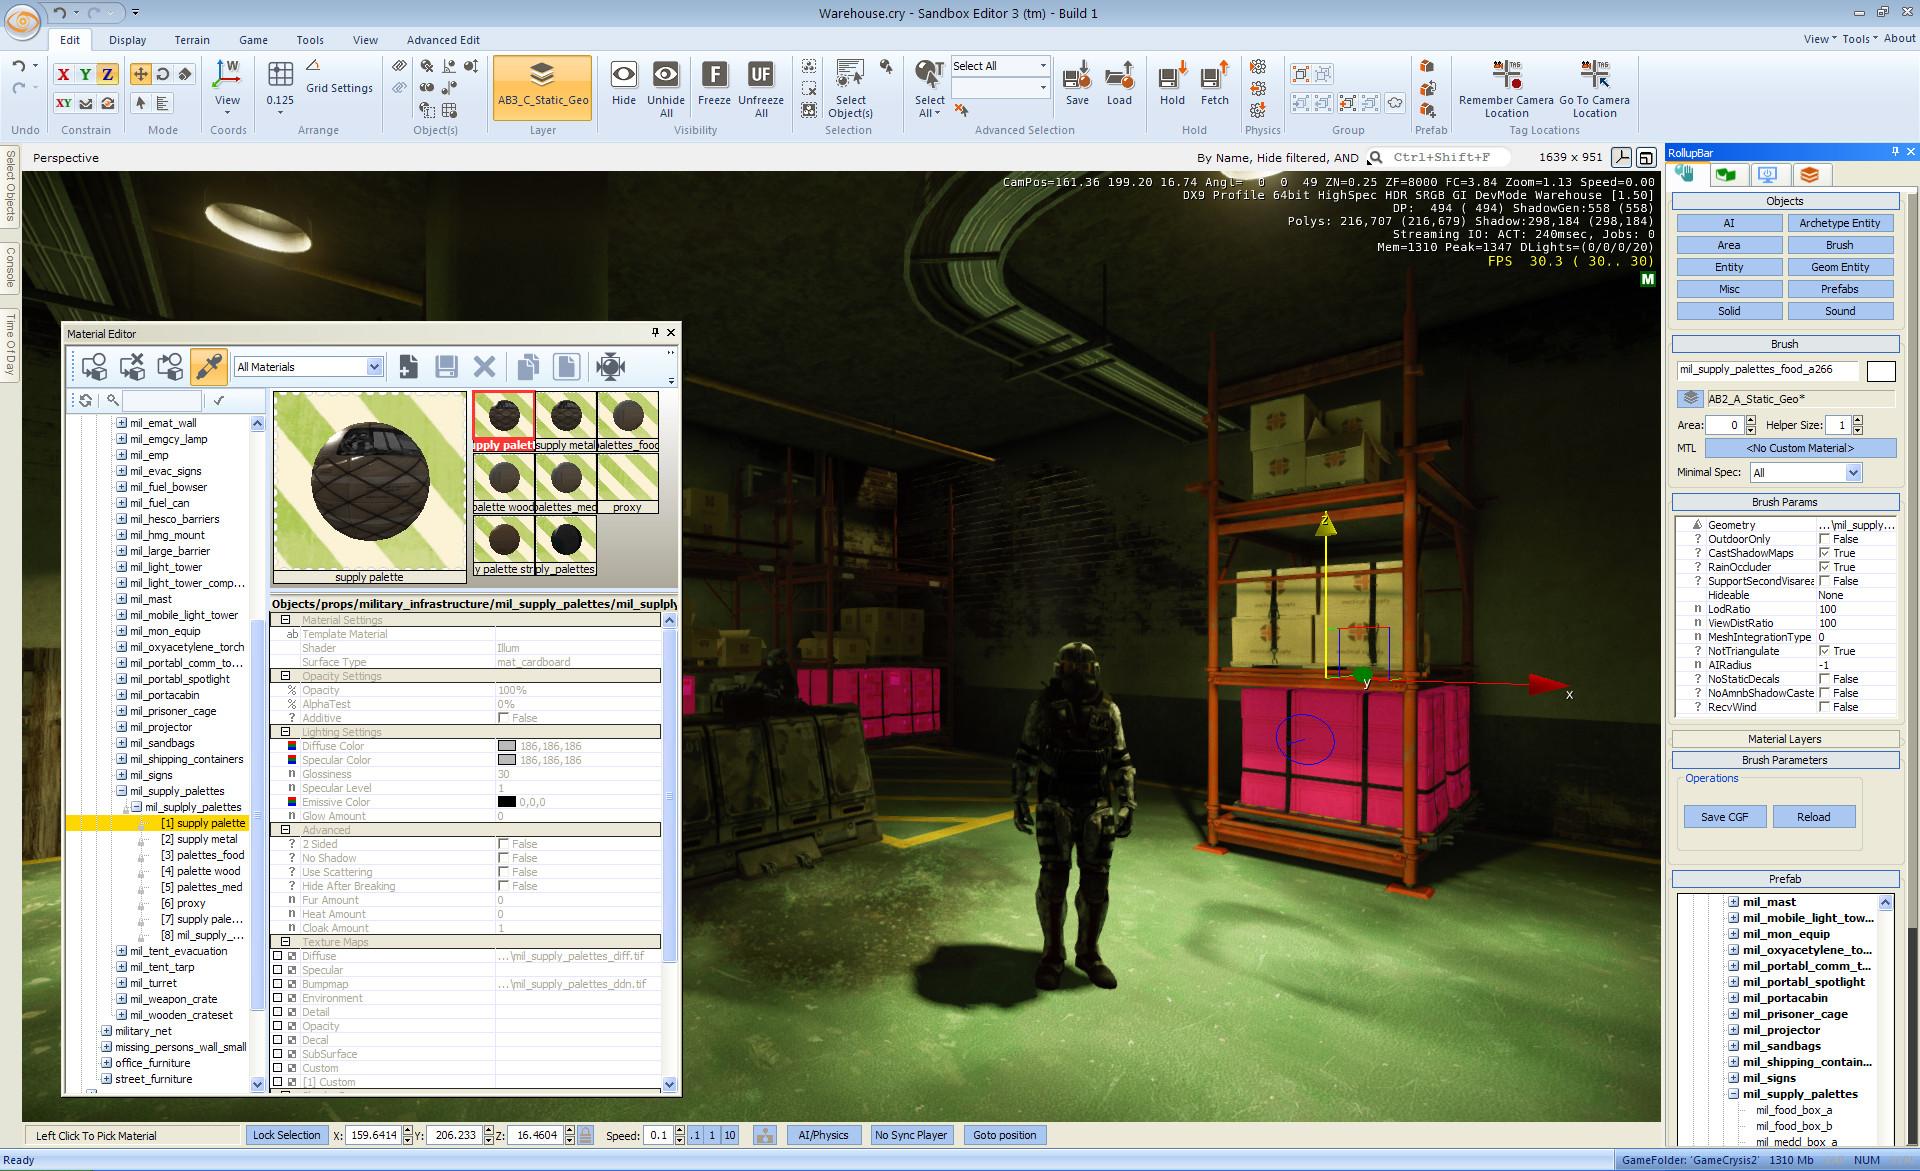 sandbox editor 3 screenshots image cryengine developers mod db